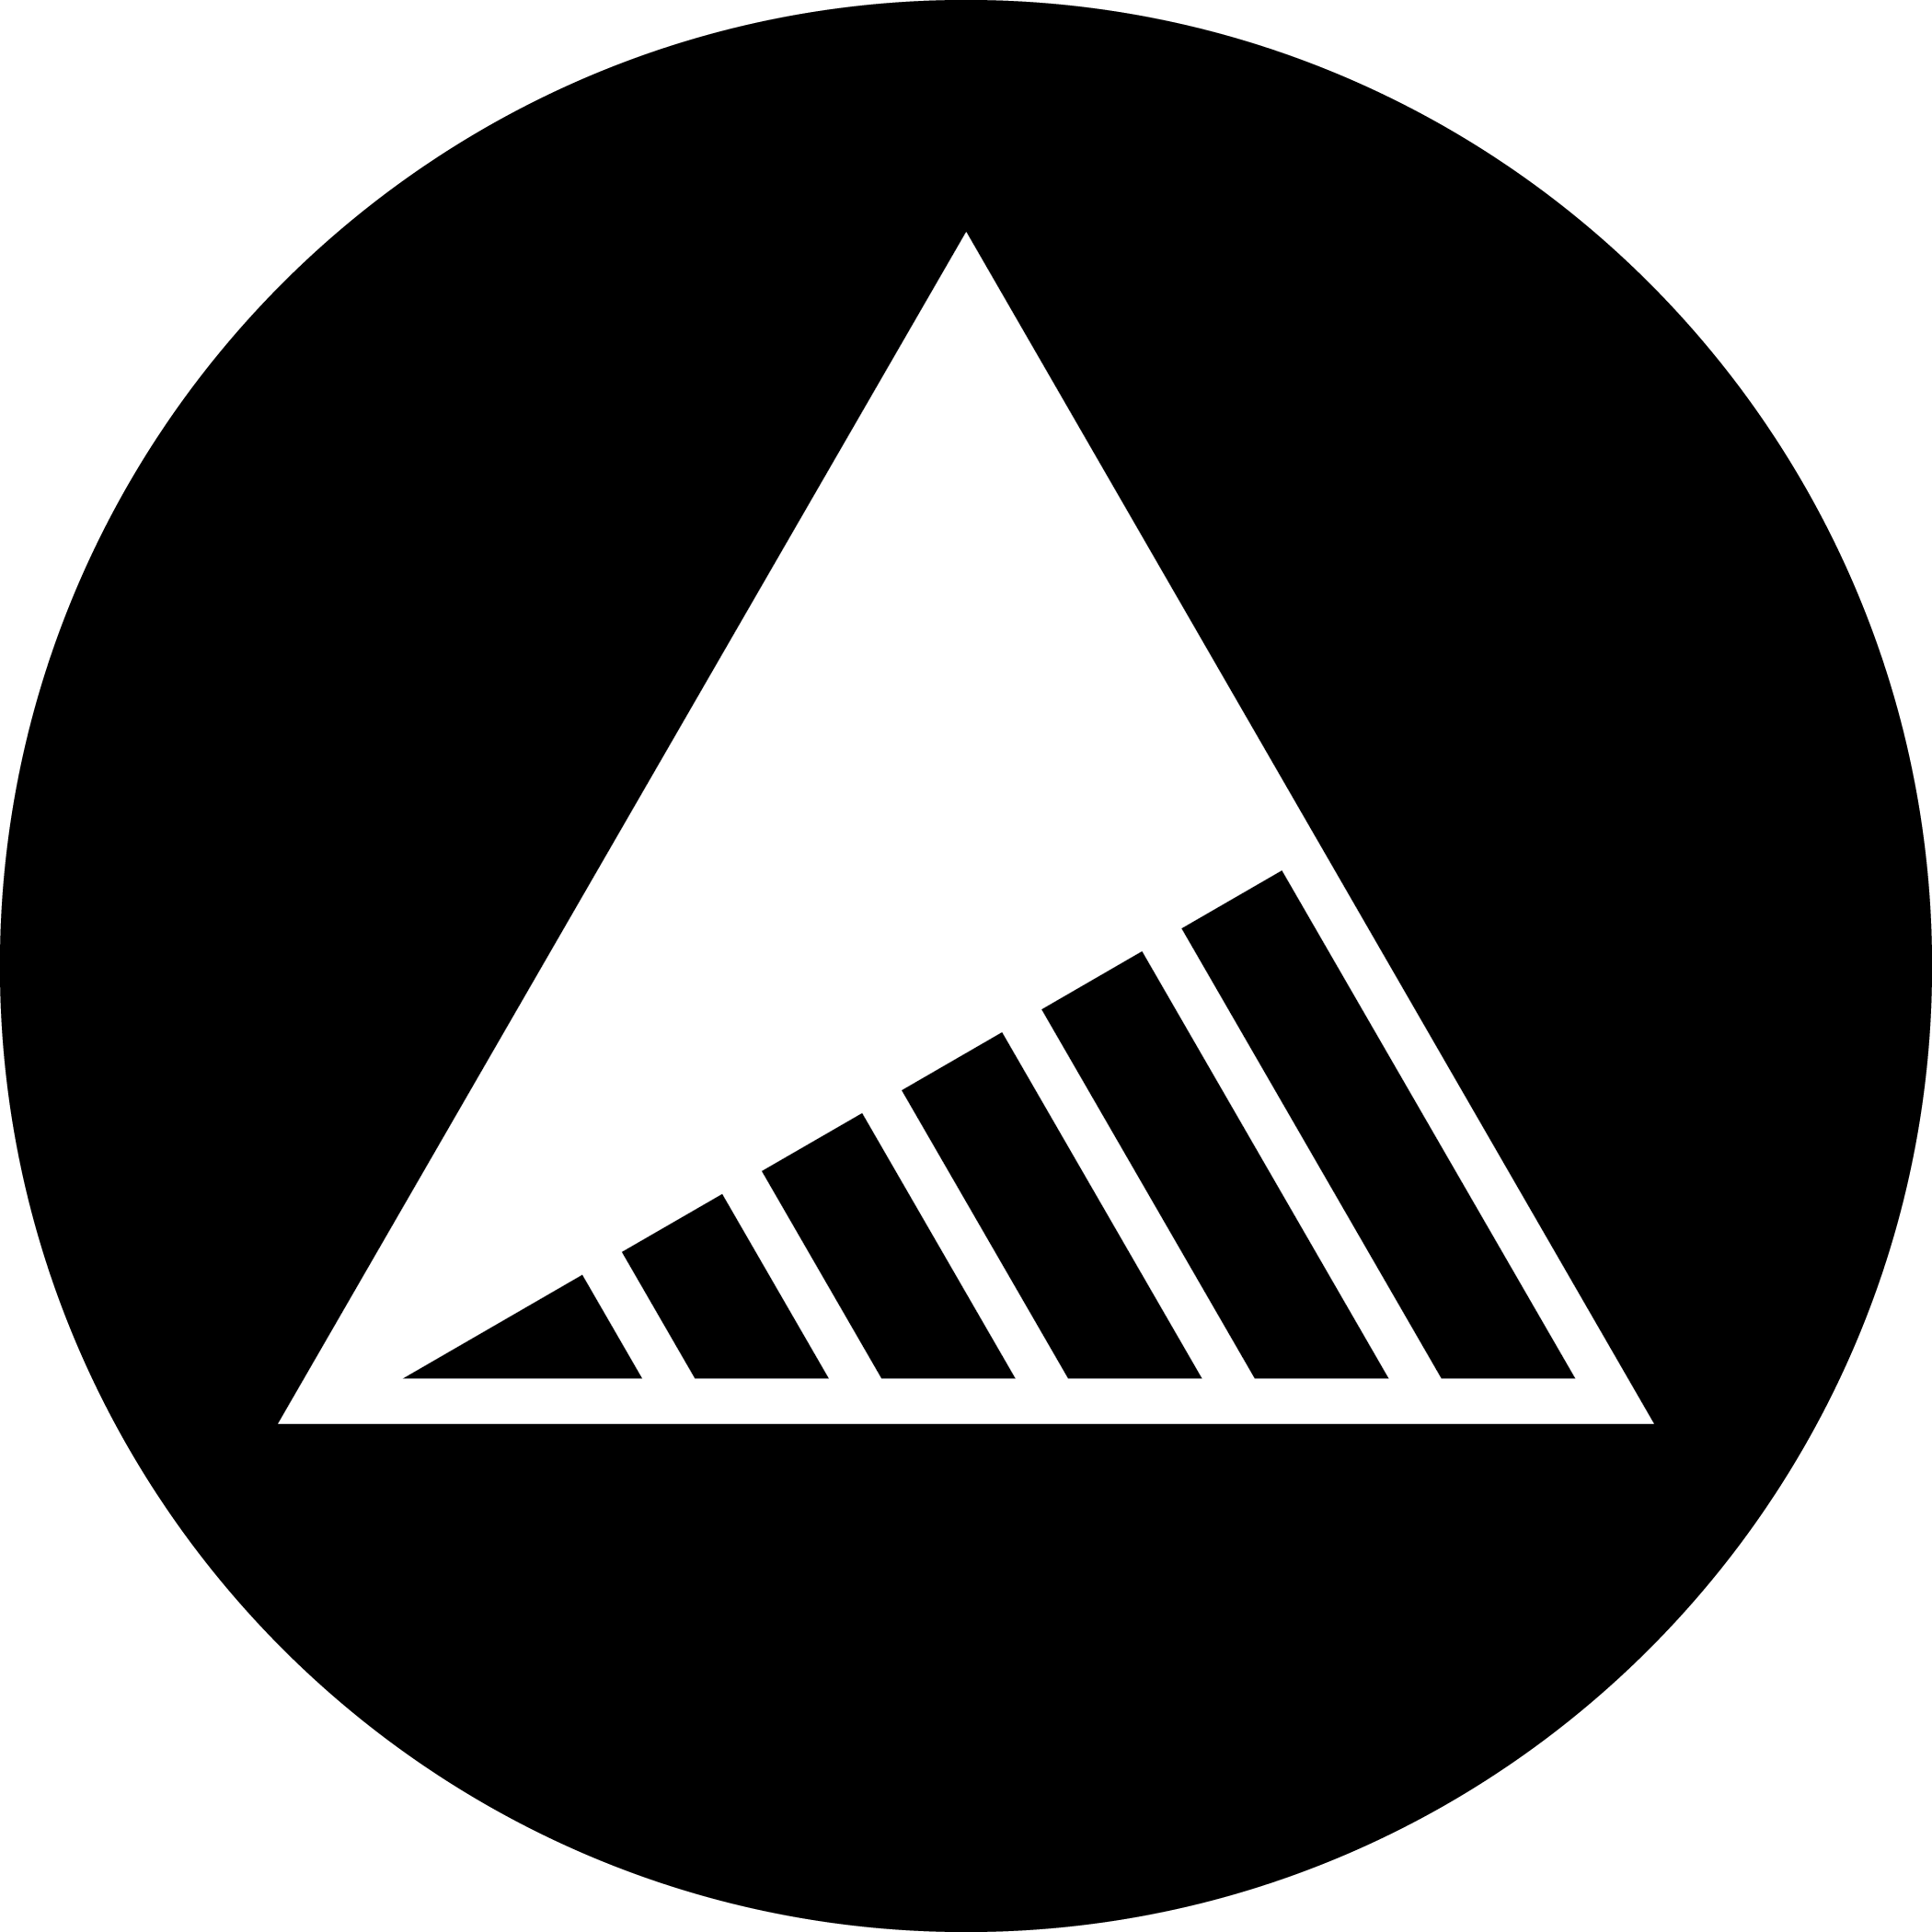 Reimagine-Spokane-Change